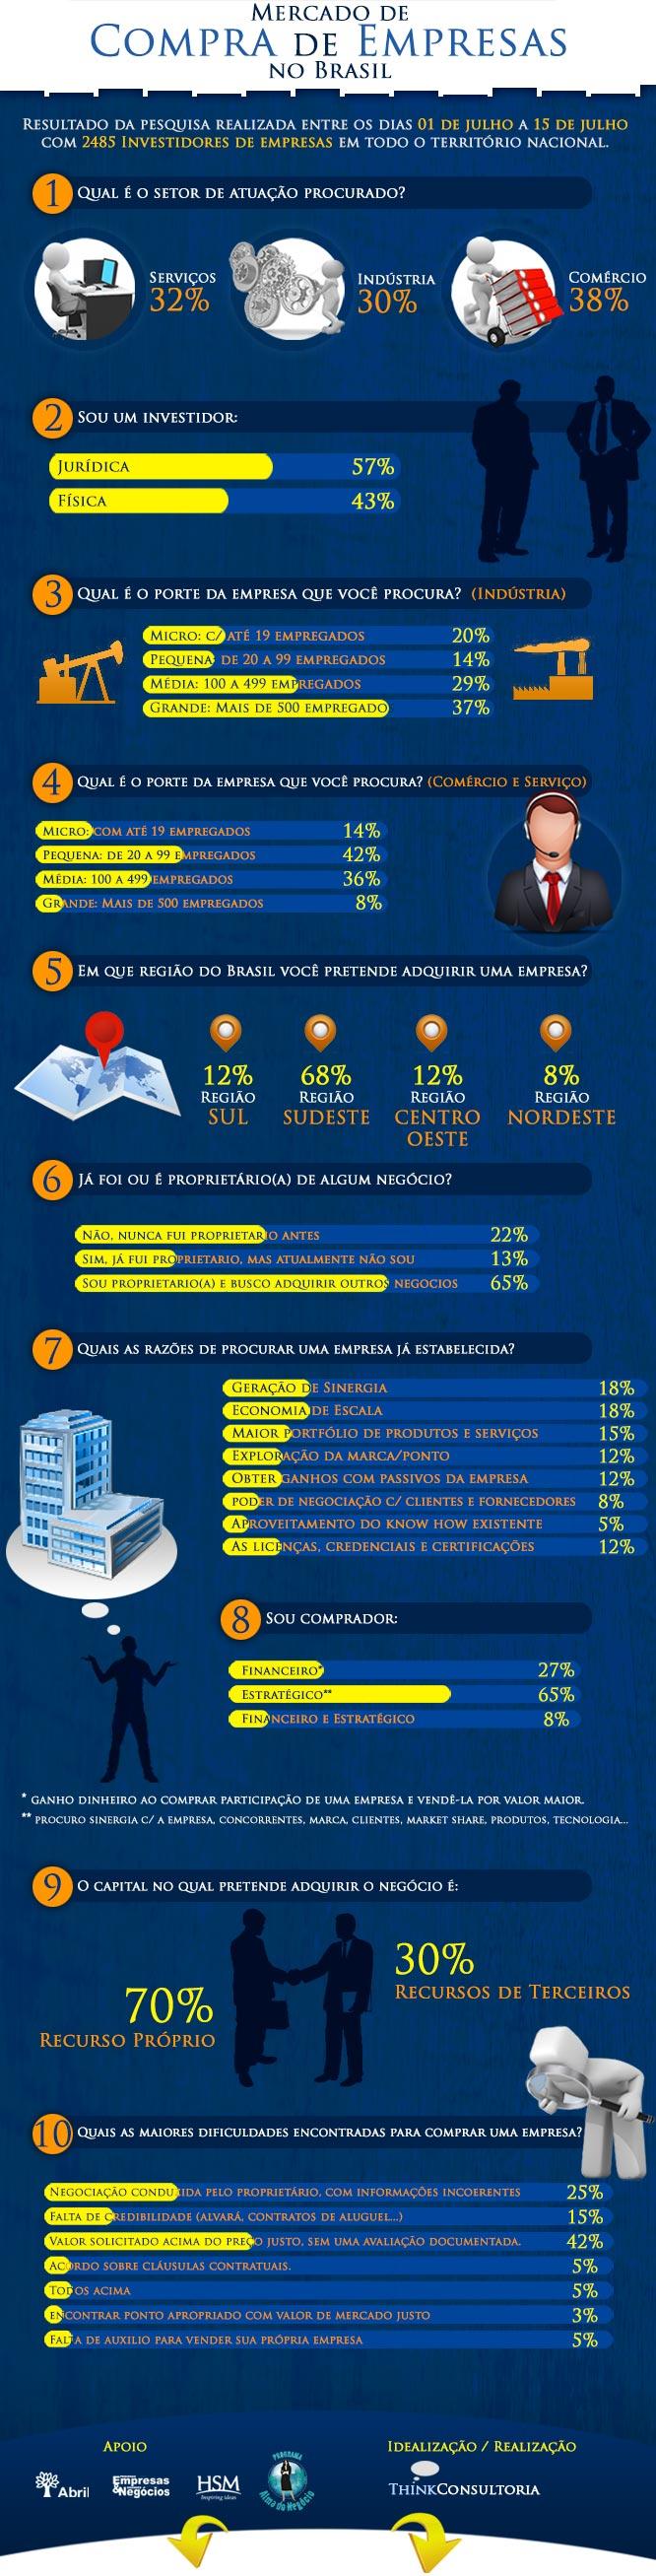 compra de empresas: dados do mercado de compra de empresa